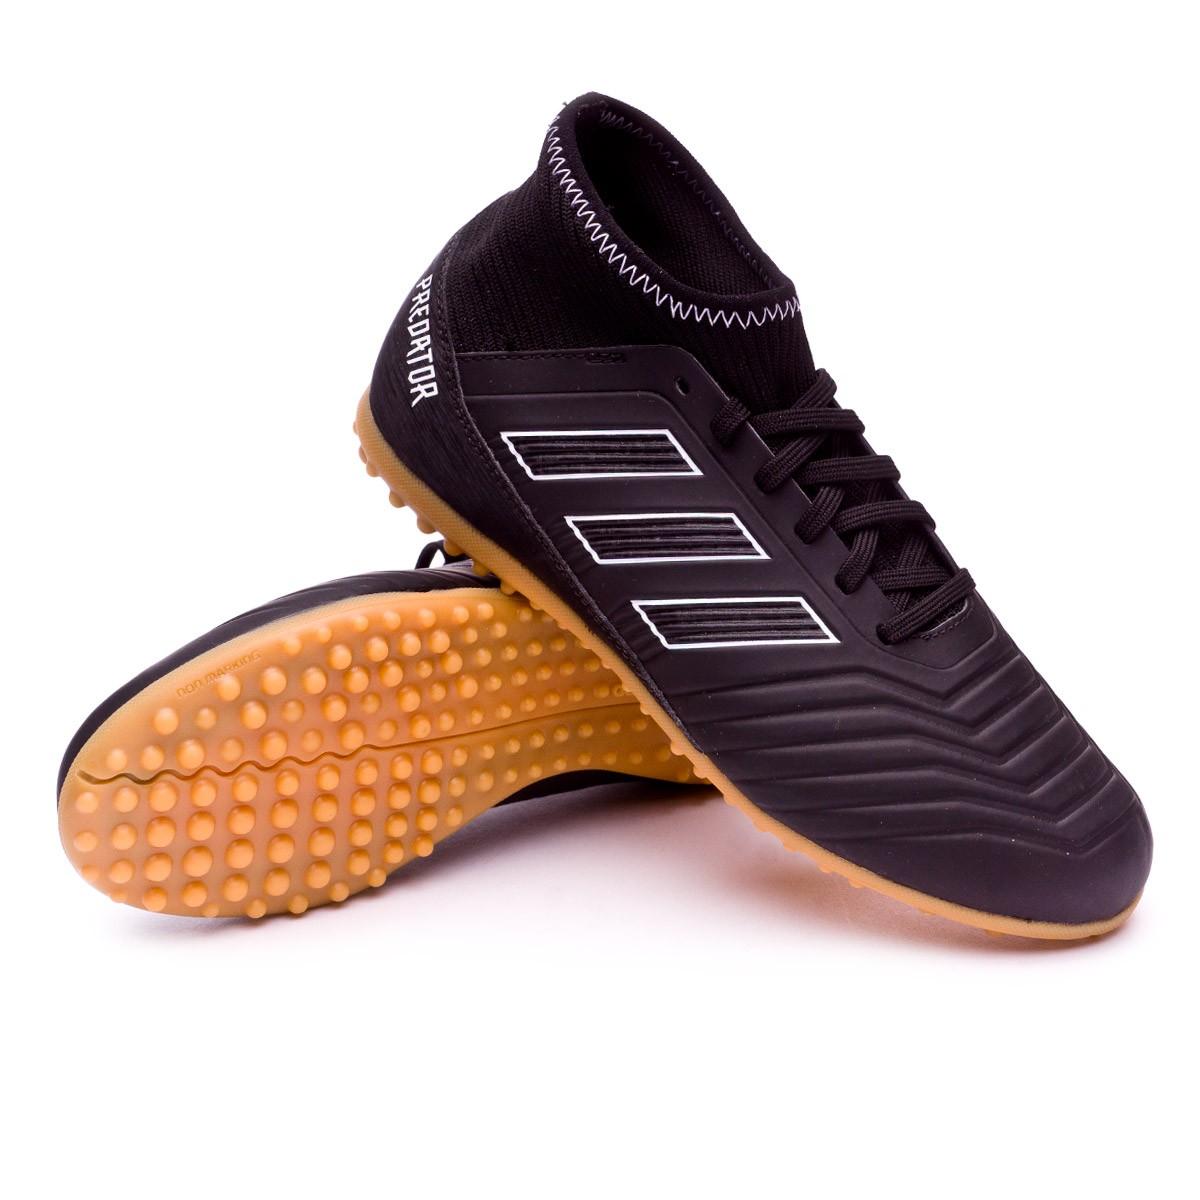 sports shoes 788c8 04bc4 adidas Kids Predator Tango 18.3 Football Boot